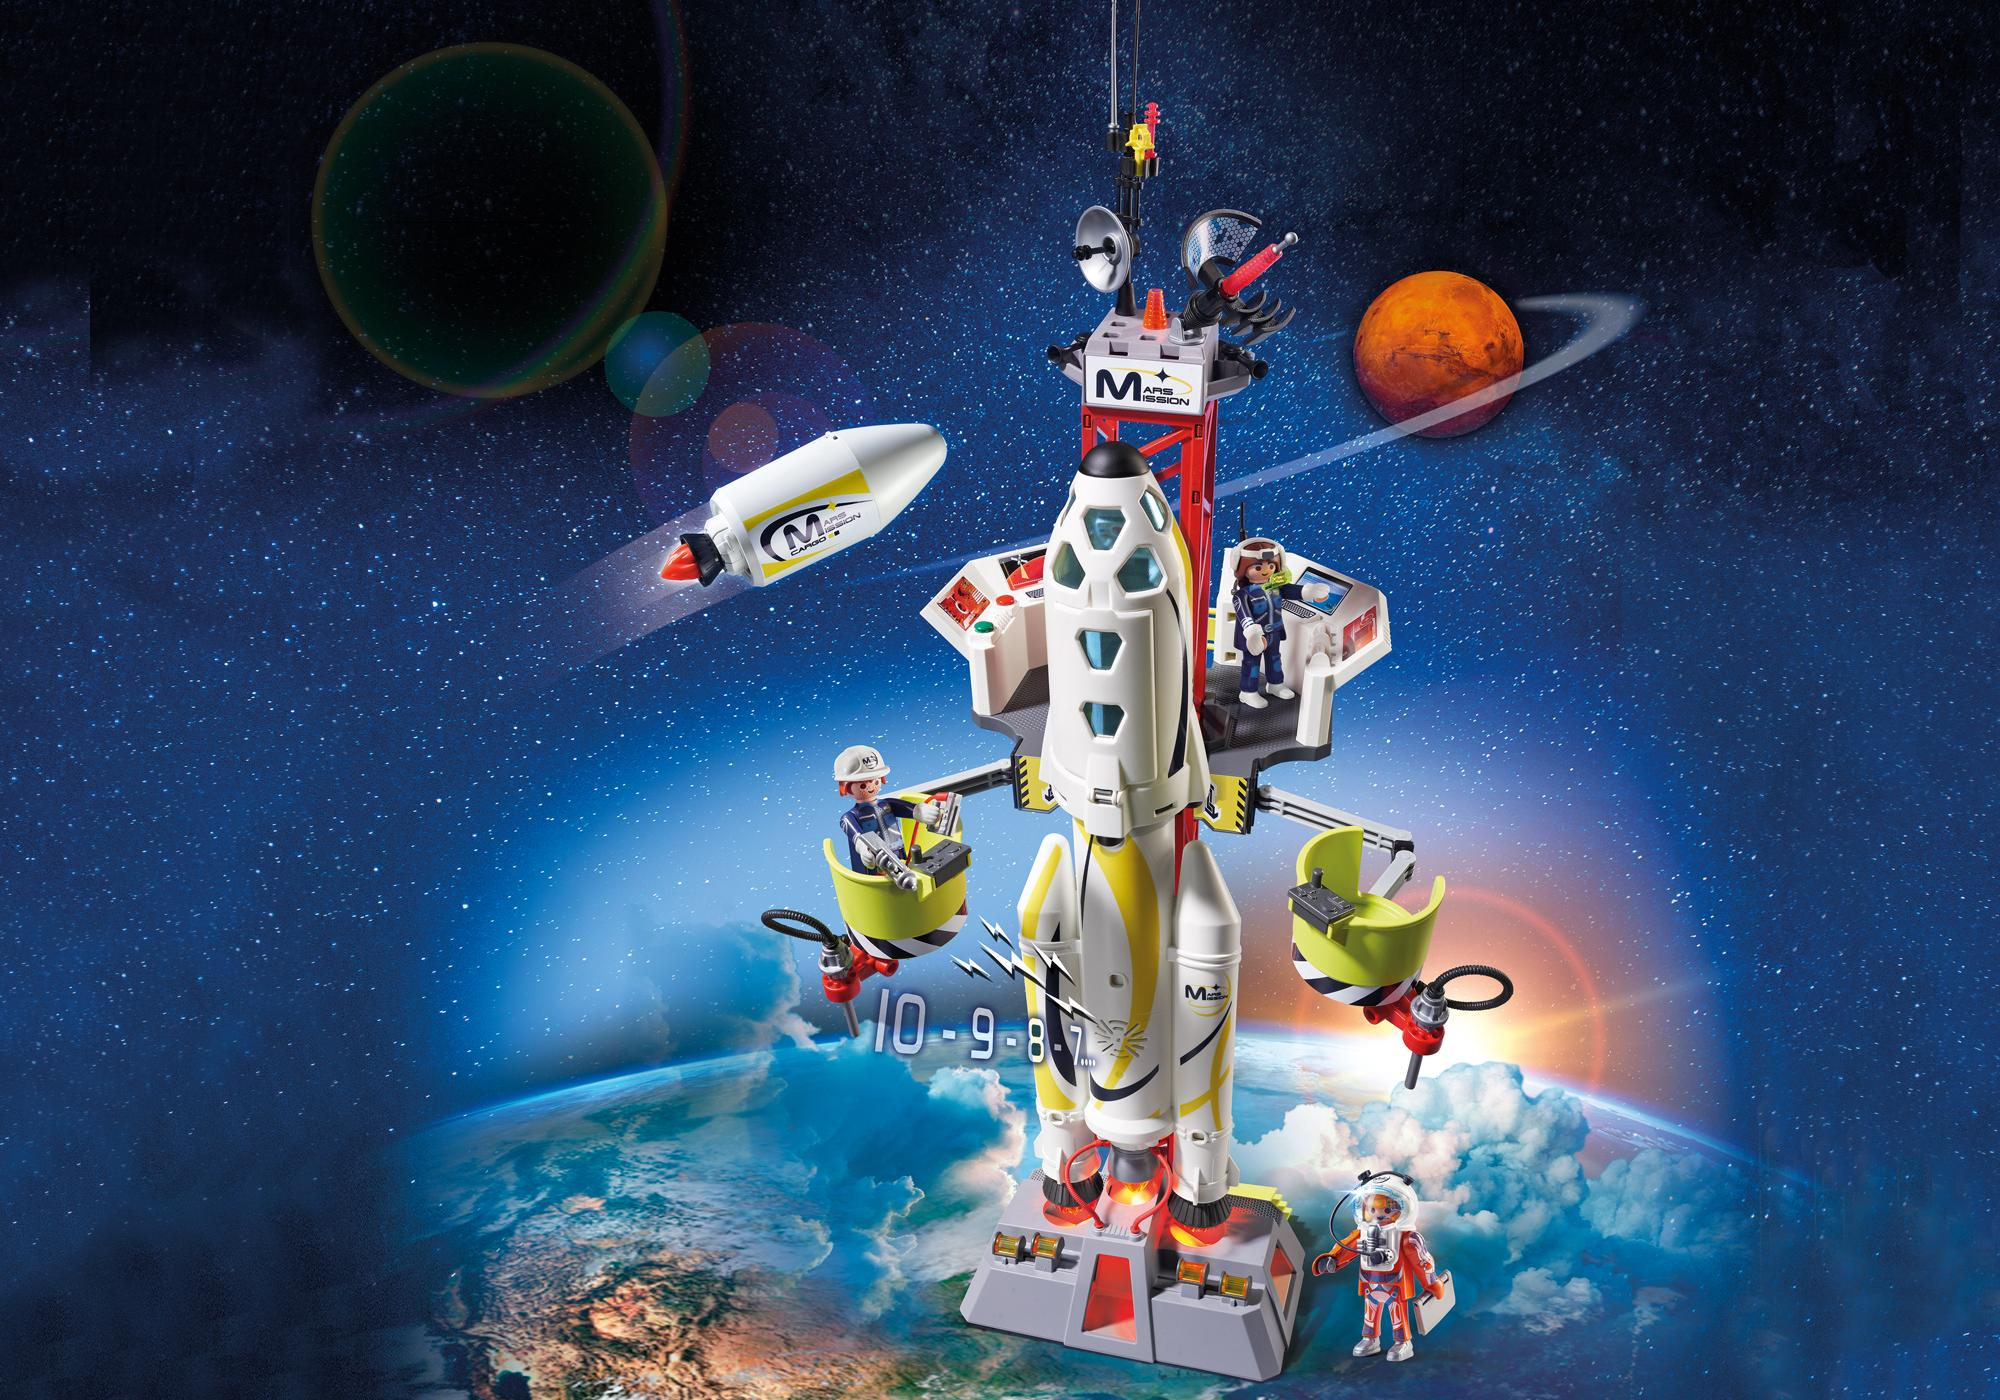 http://media.playmobil.com/i/playmobil/9488_product_detail/Mars-raket met lanceerplatform